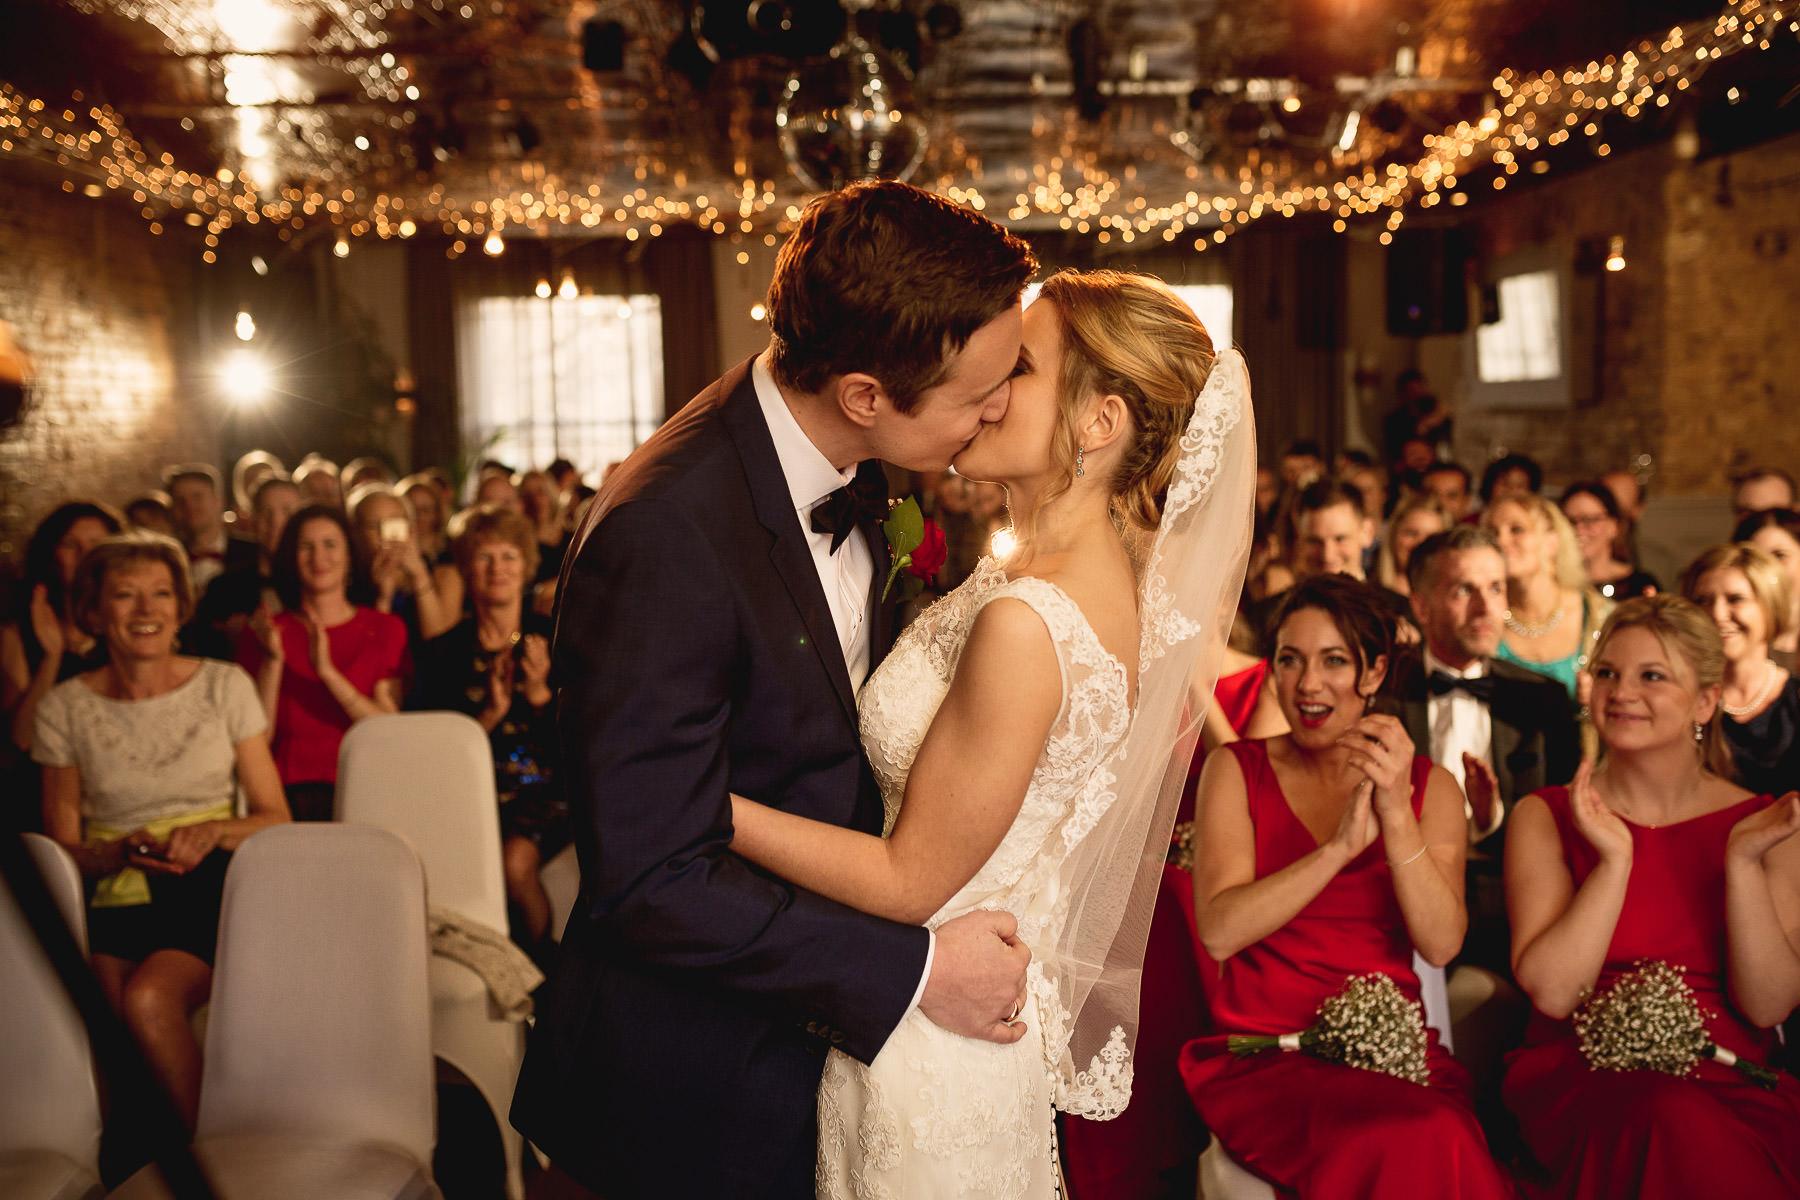 century club wedding photography